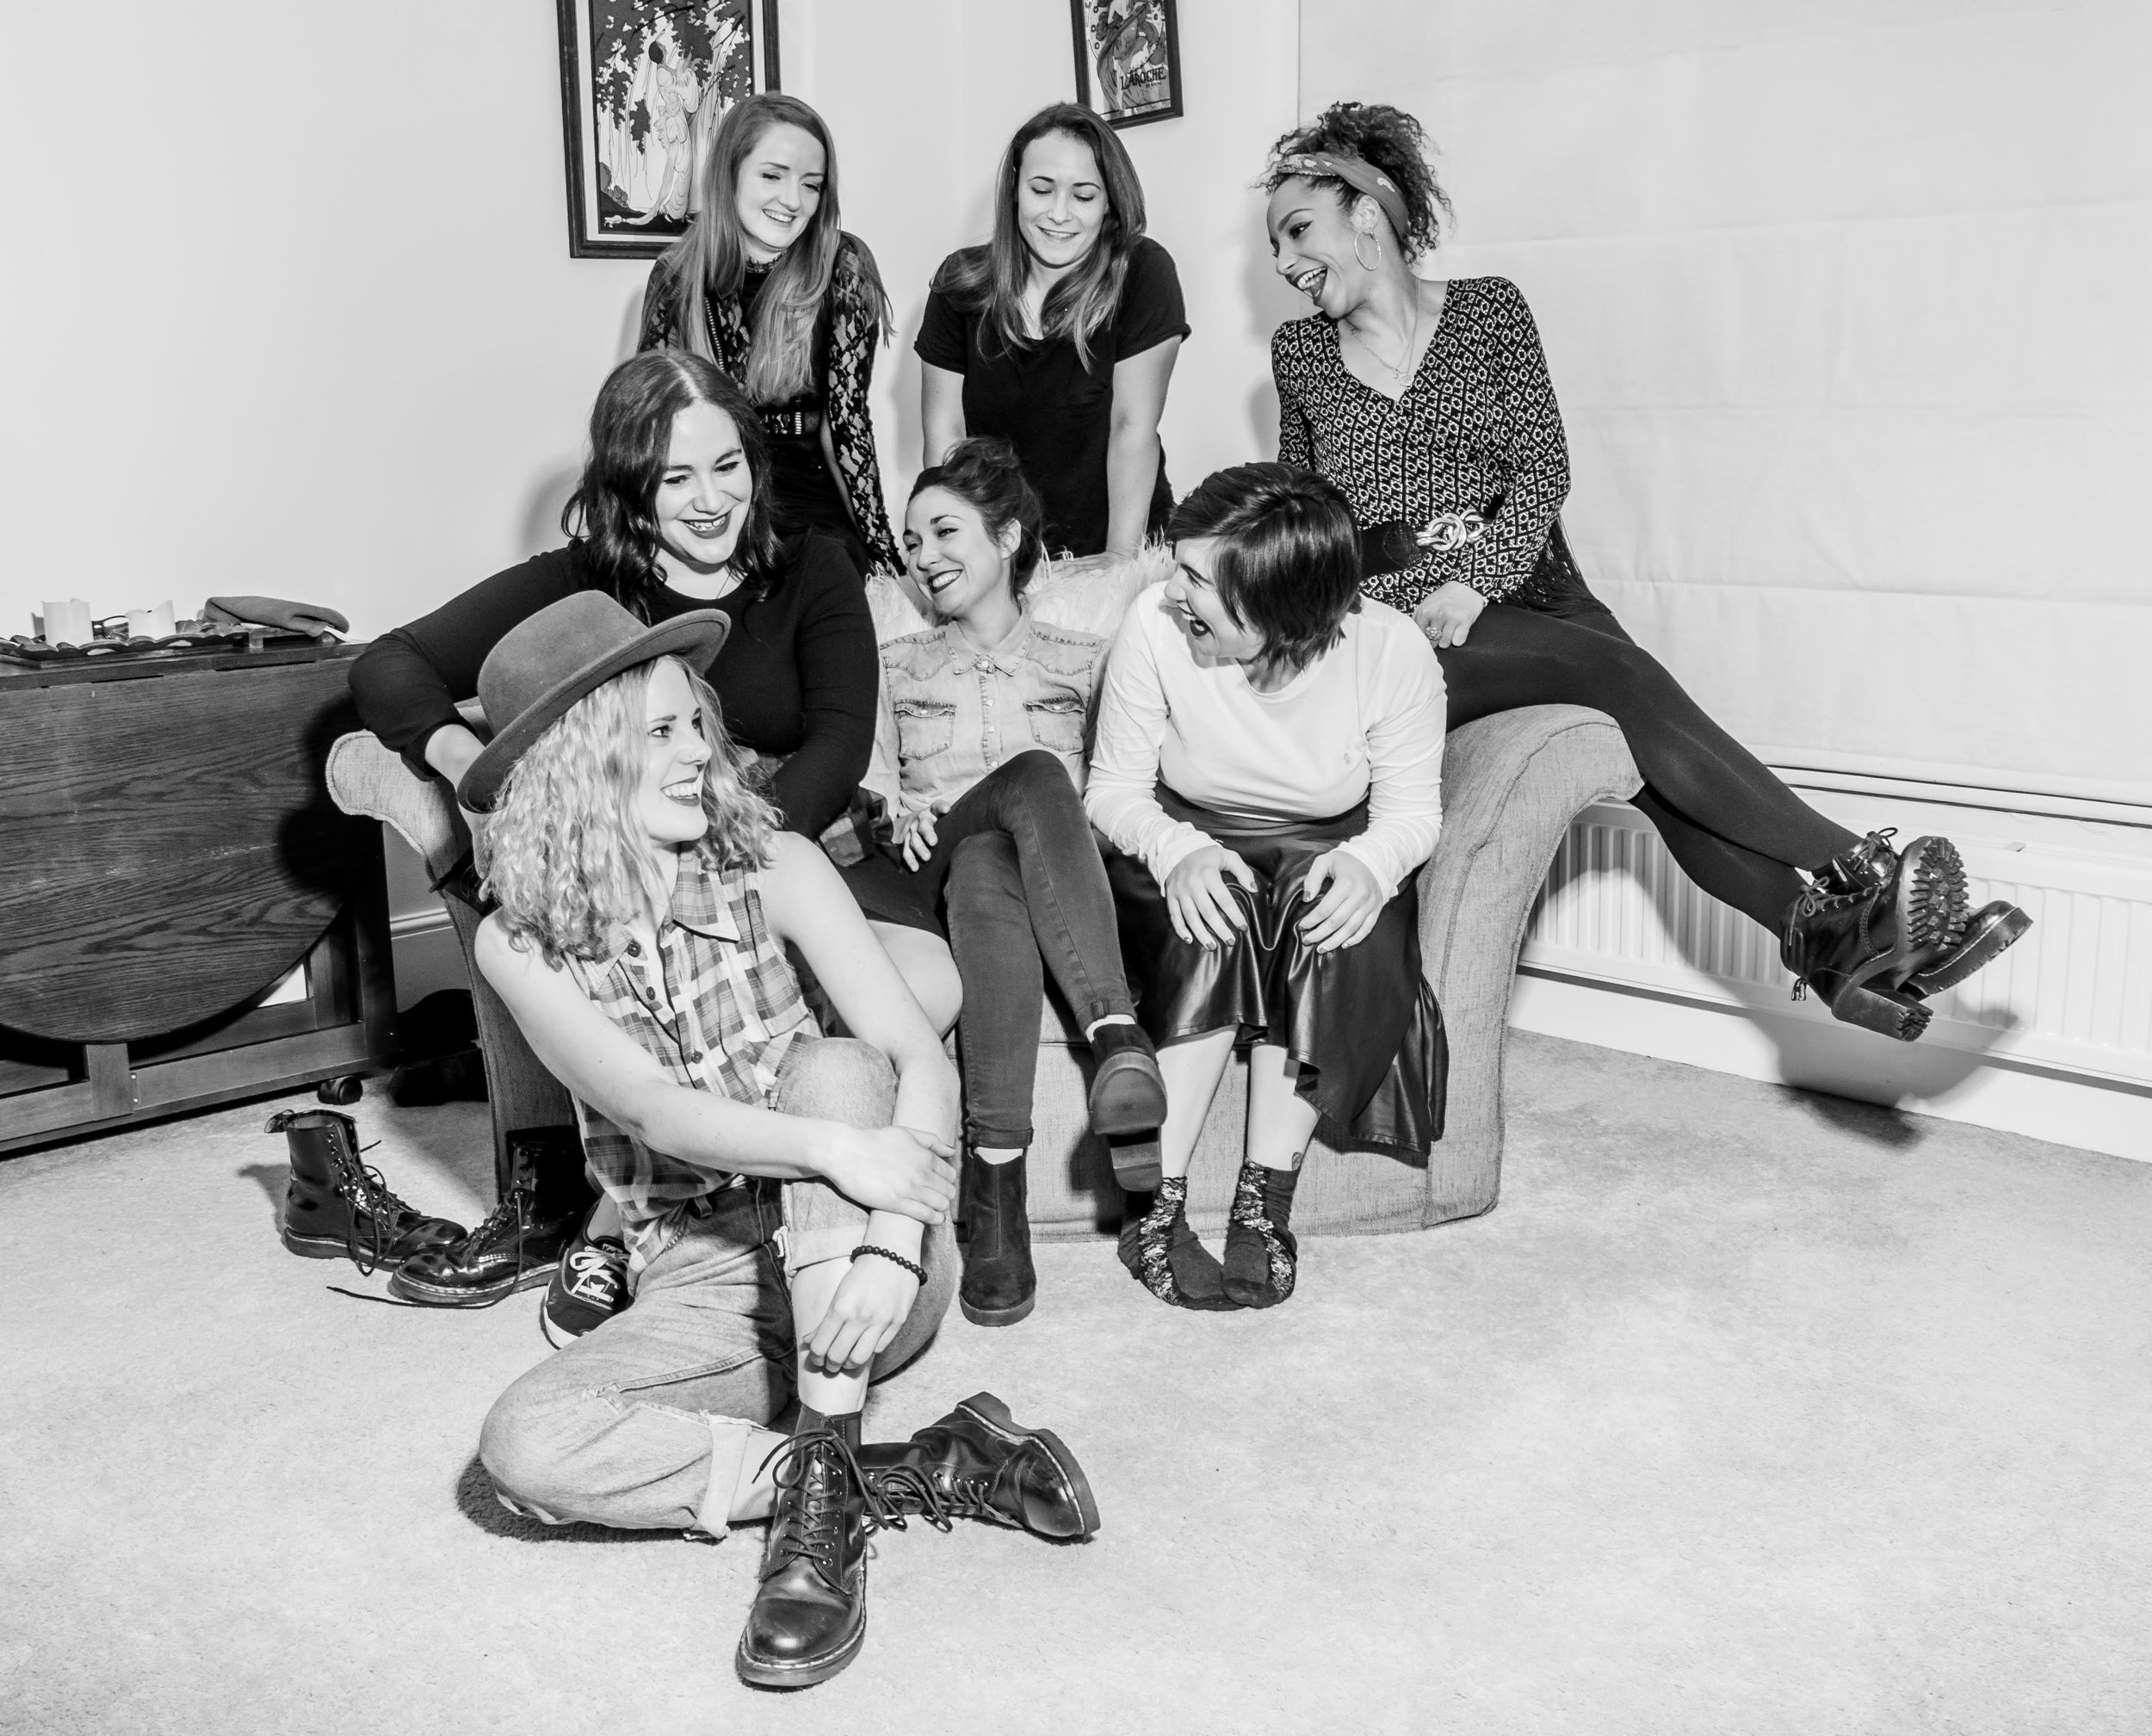 The She Street Band